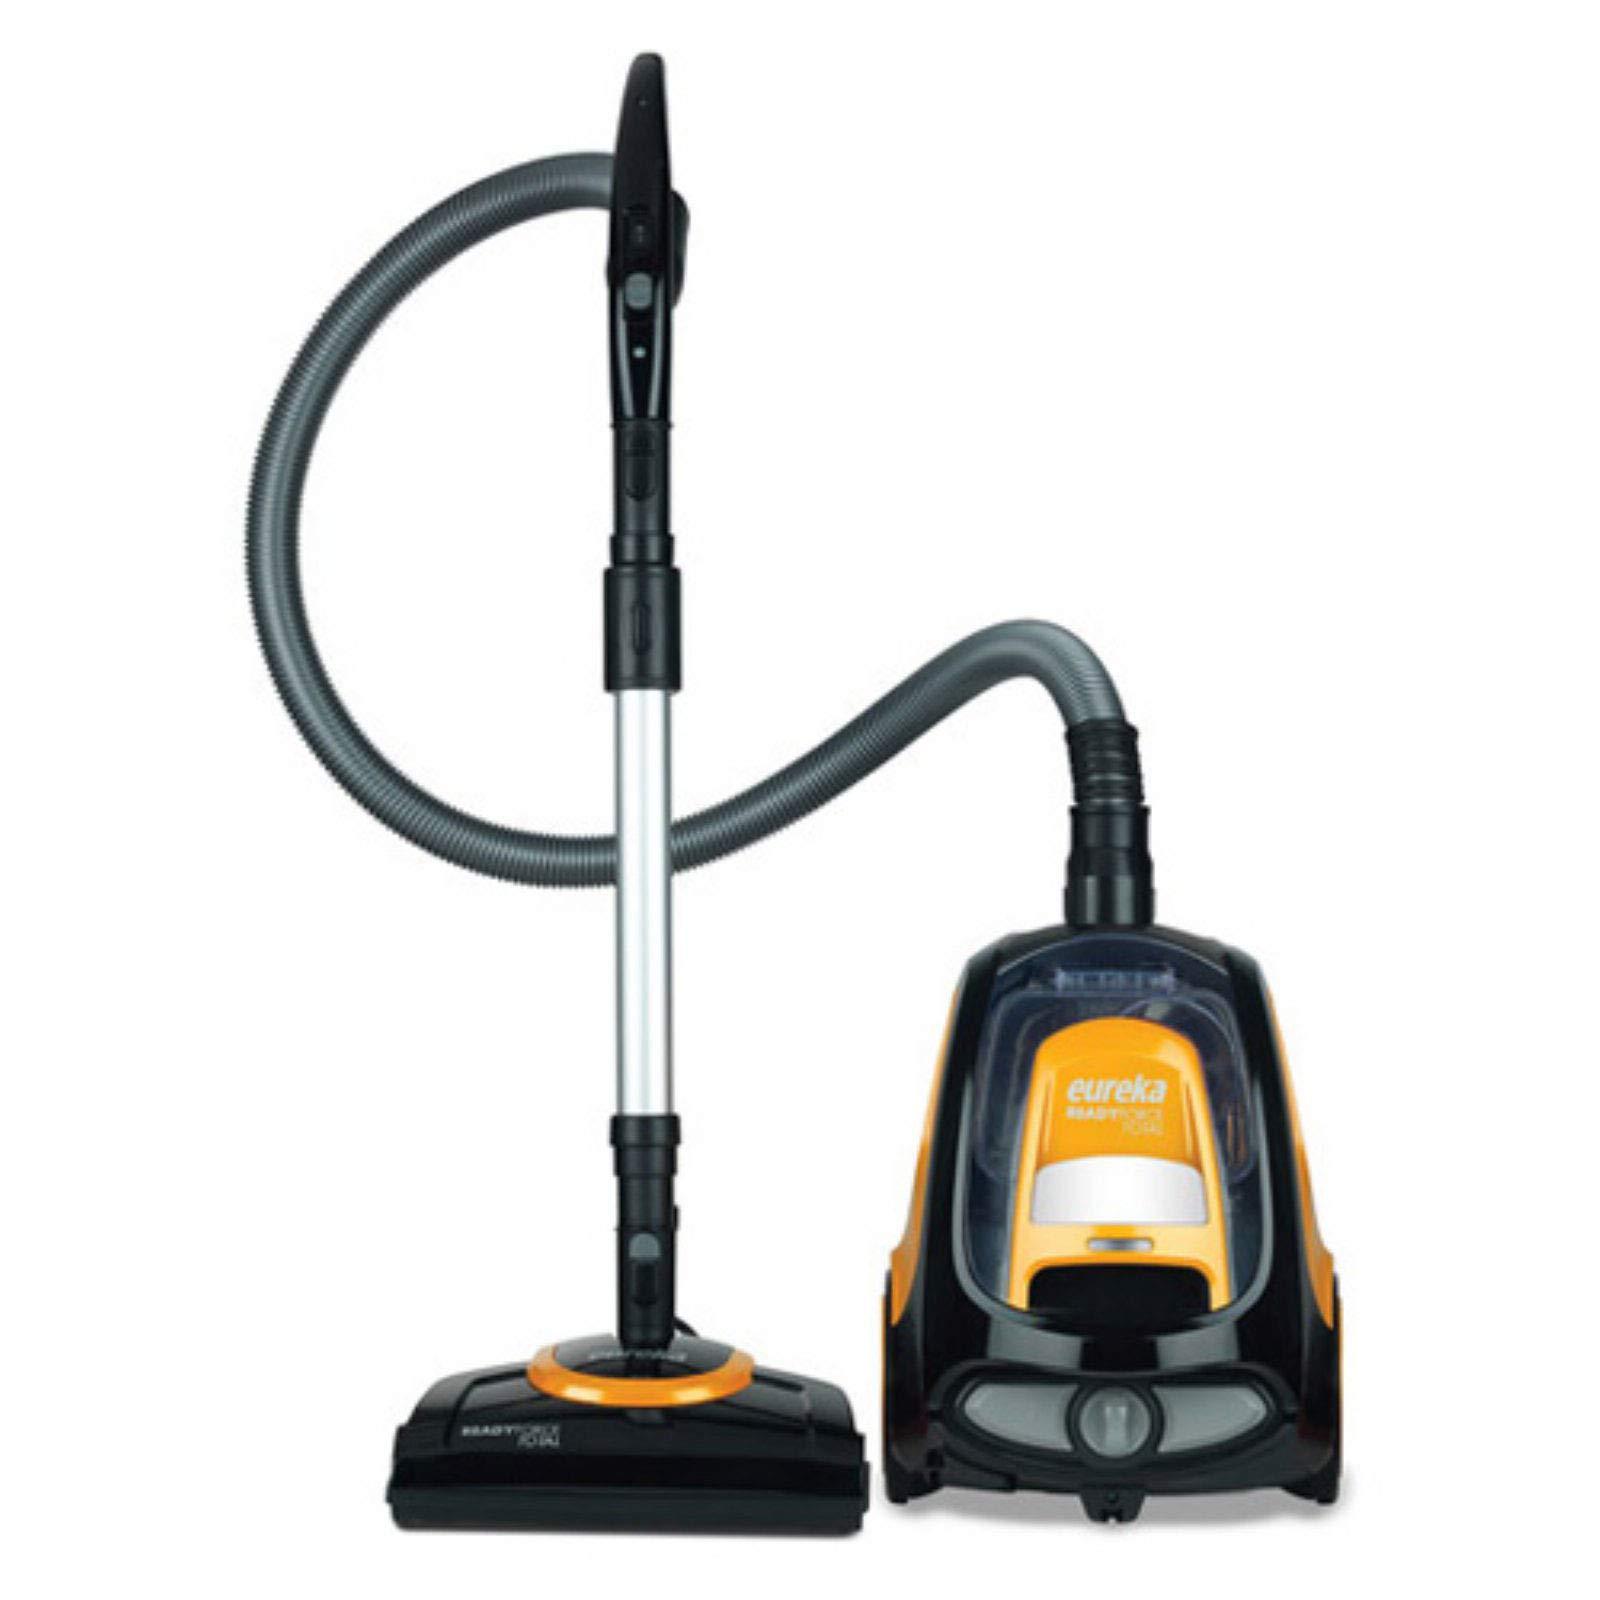 Eureka ReadyForce Total Bagless Canister Vacuum Cleaner (Renewed)